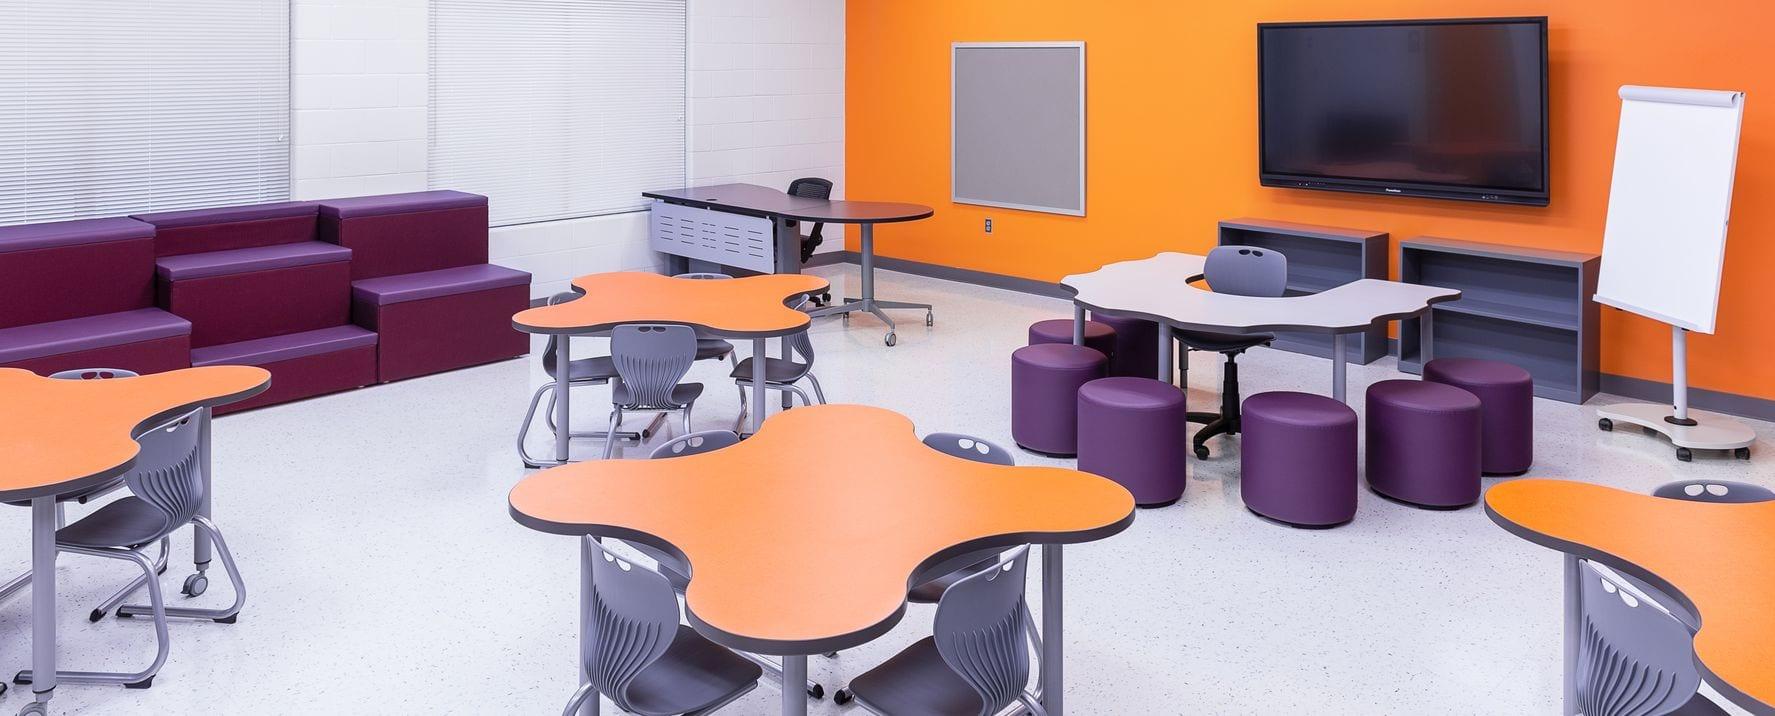 Education Facility Interior Planning Design Services